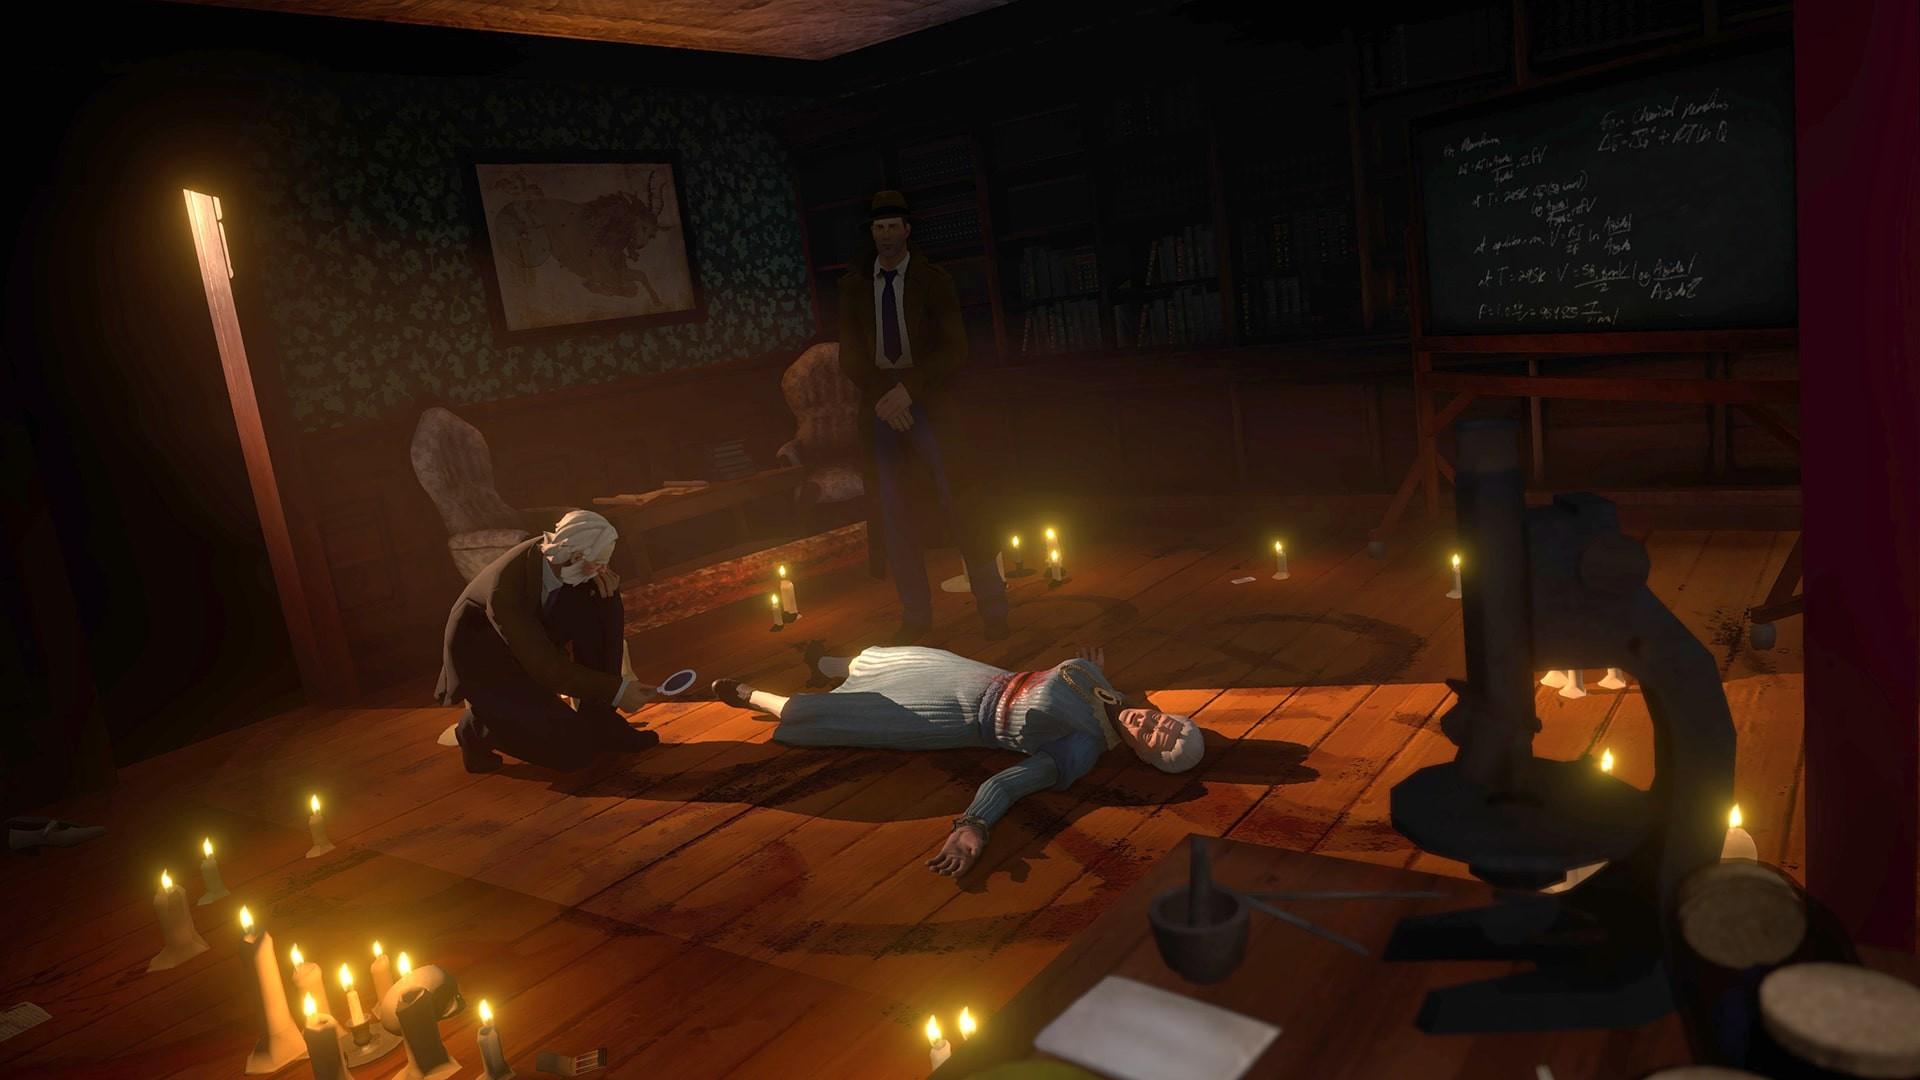 arkham horror mothers embrace screenshot.png